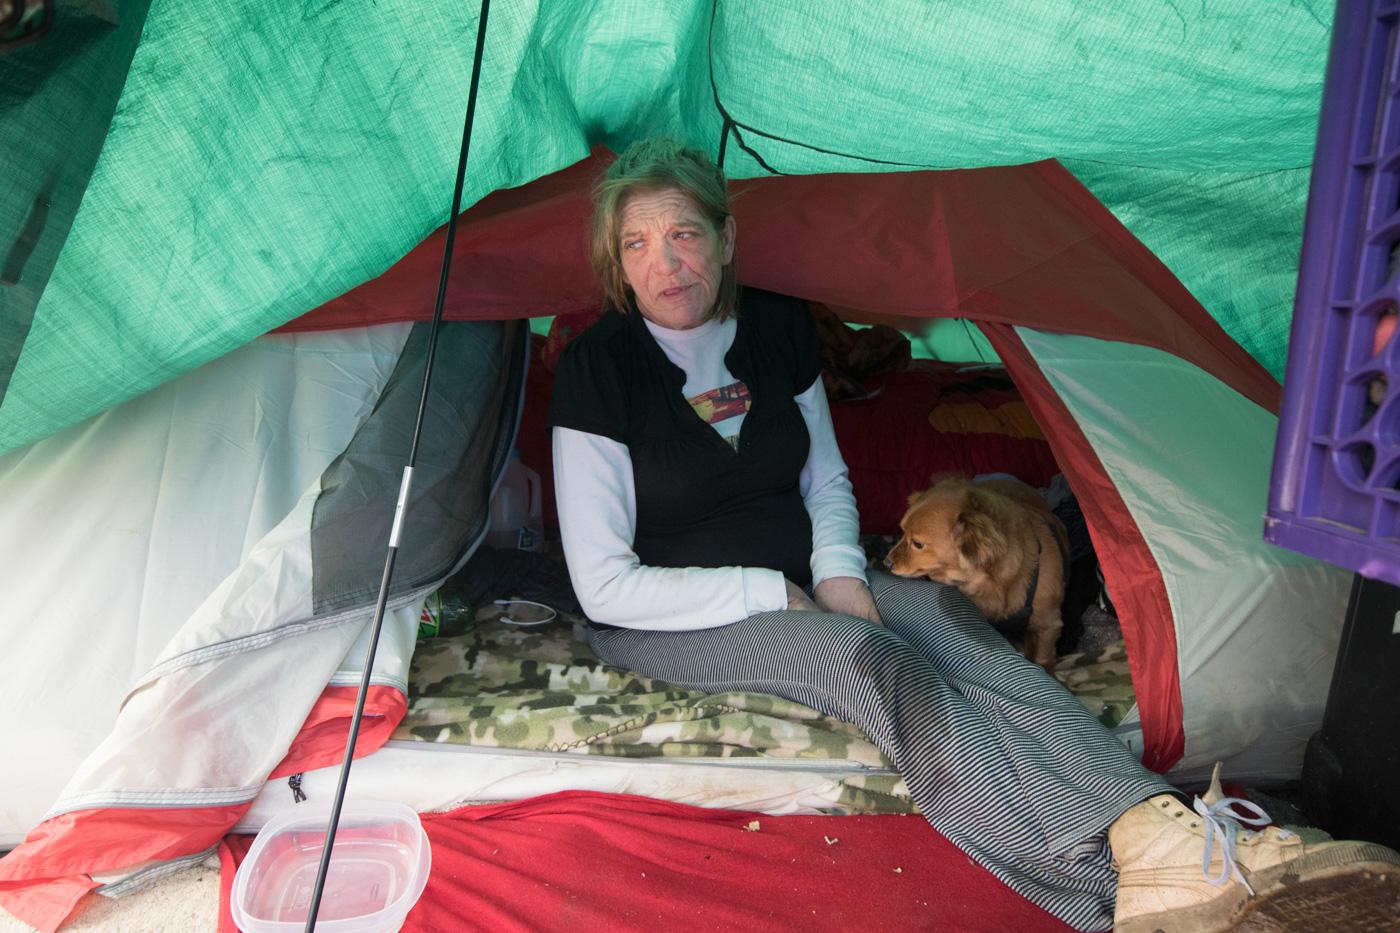 liz obert_usa_urban campers-4.jpg